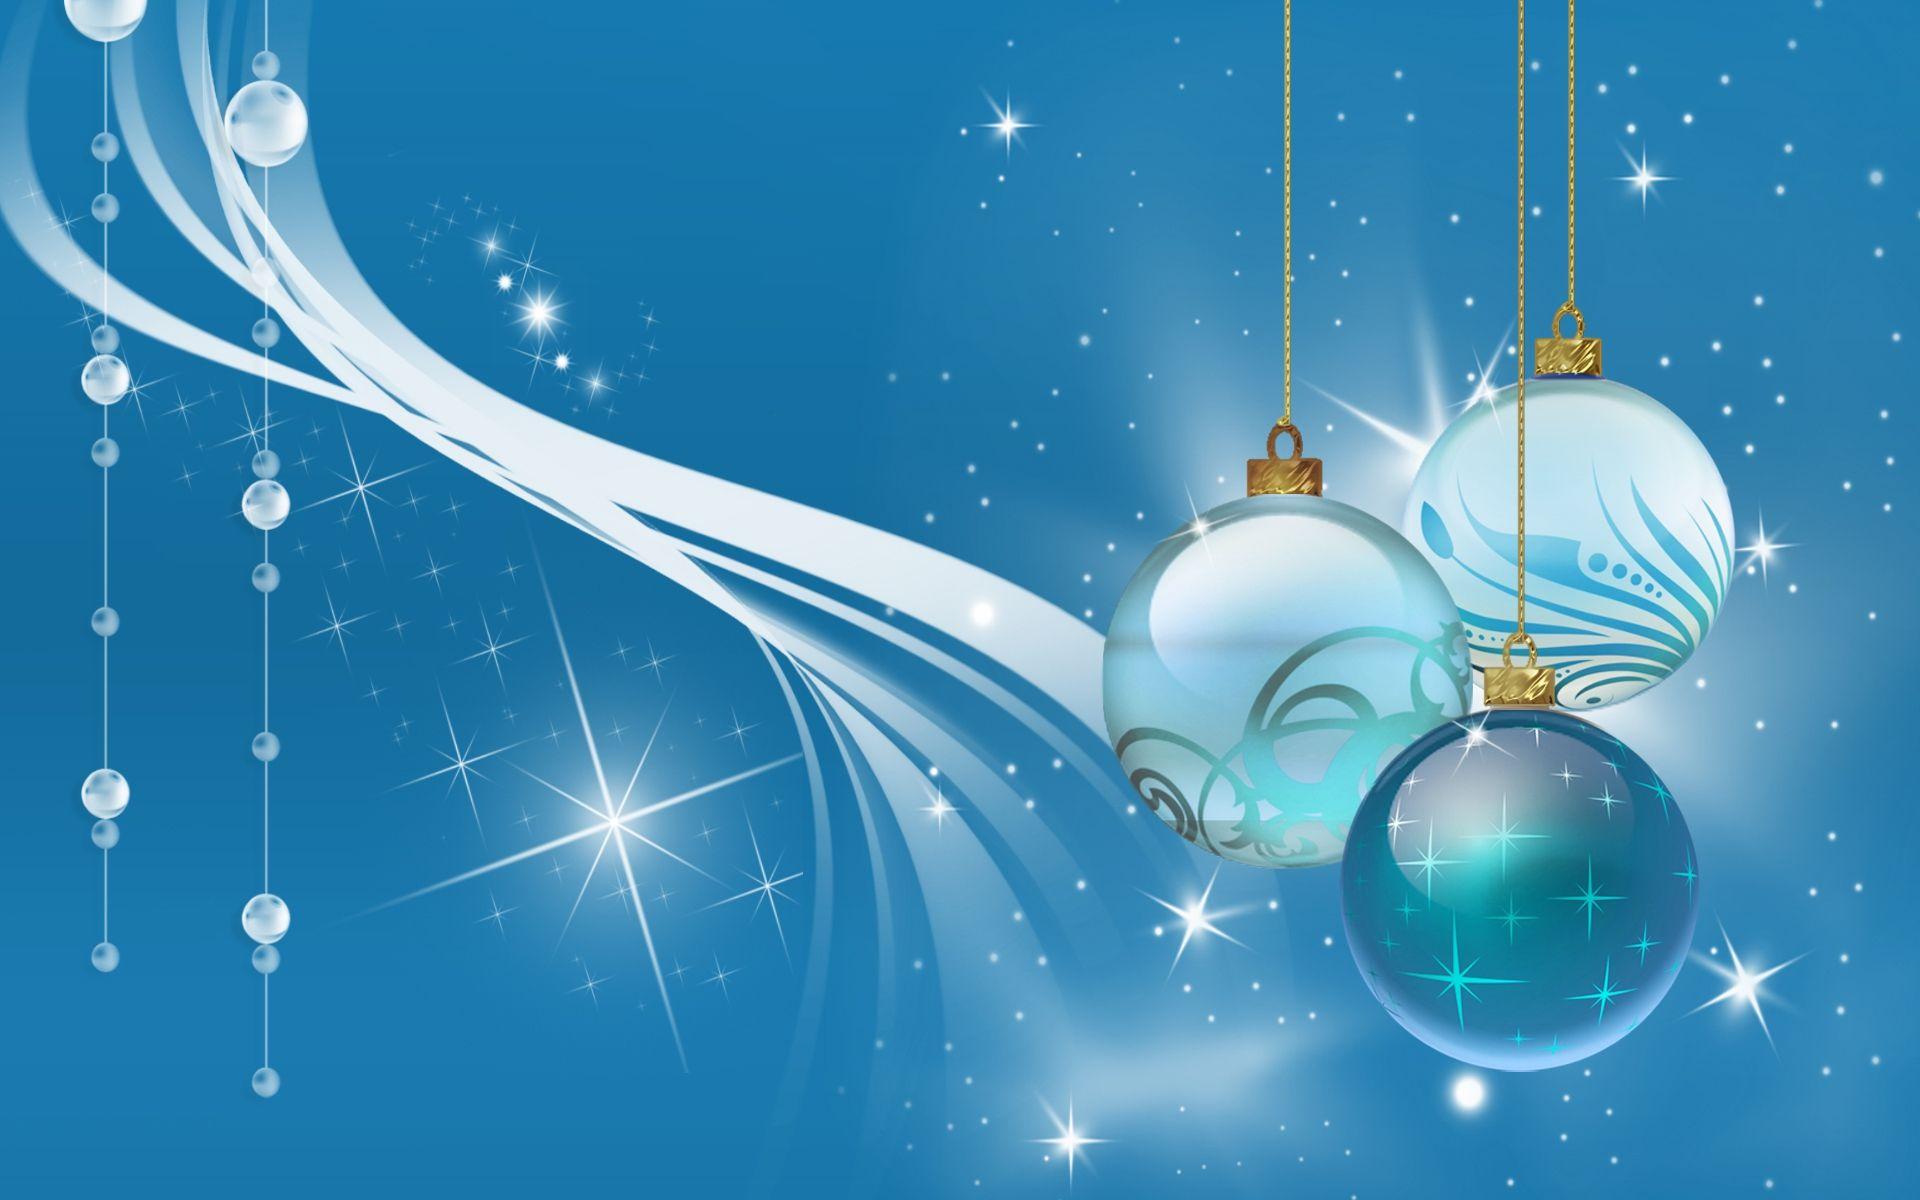 Blue Christmas Wallpaper Hd Pixelstalk Net Christmas Wallpaper Hd Christmas Wallpaper Blue Christmas Desktop christmas wallpaper hd